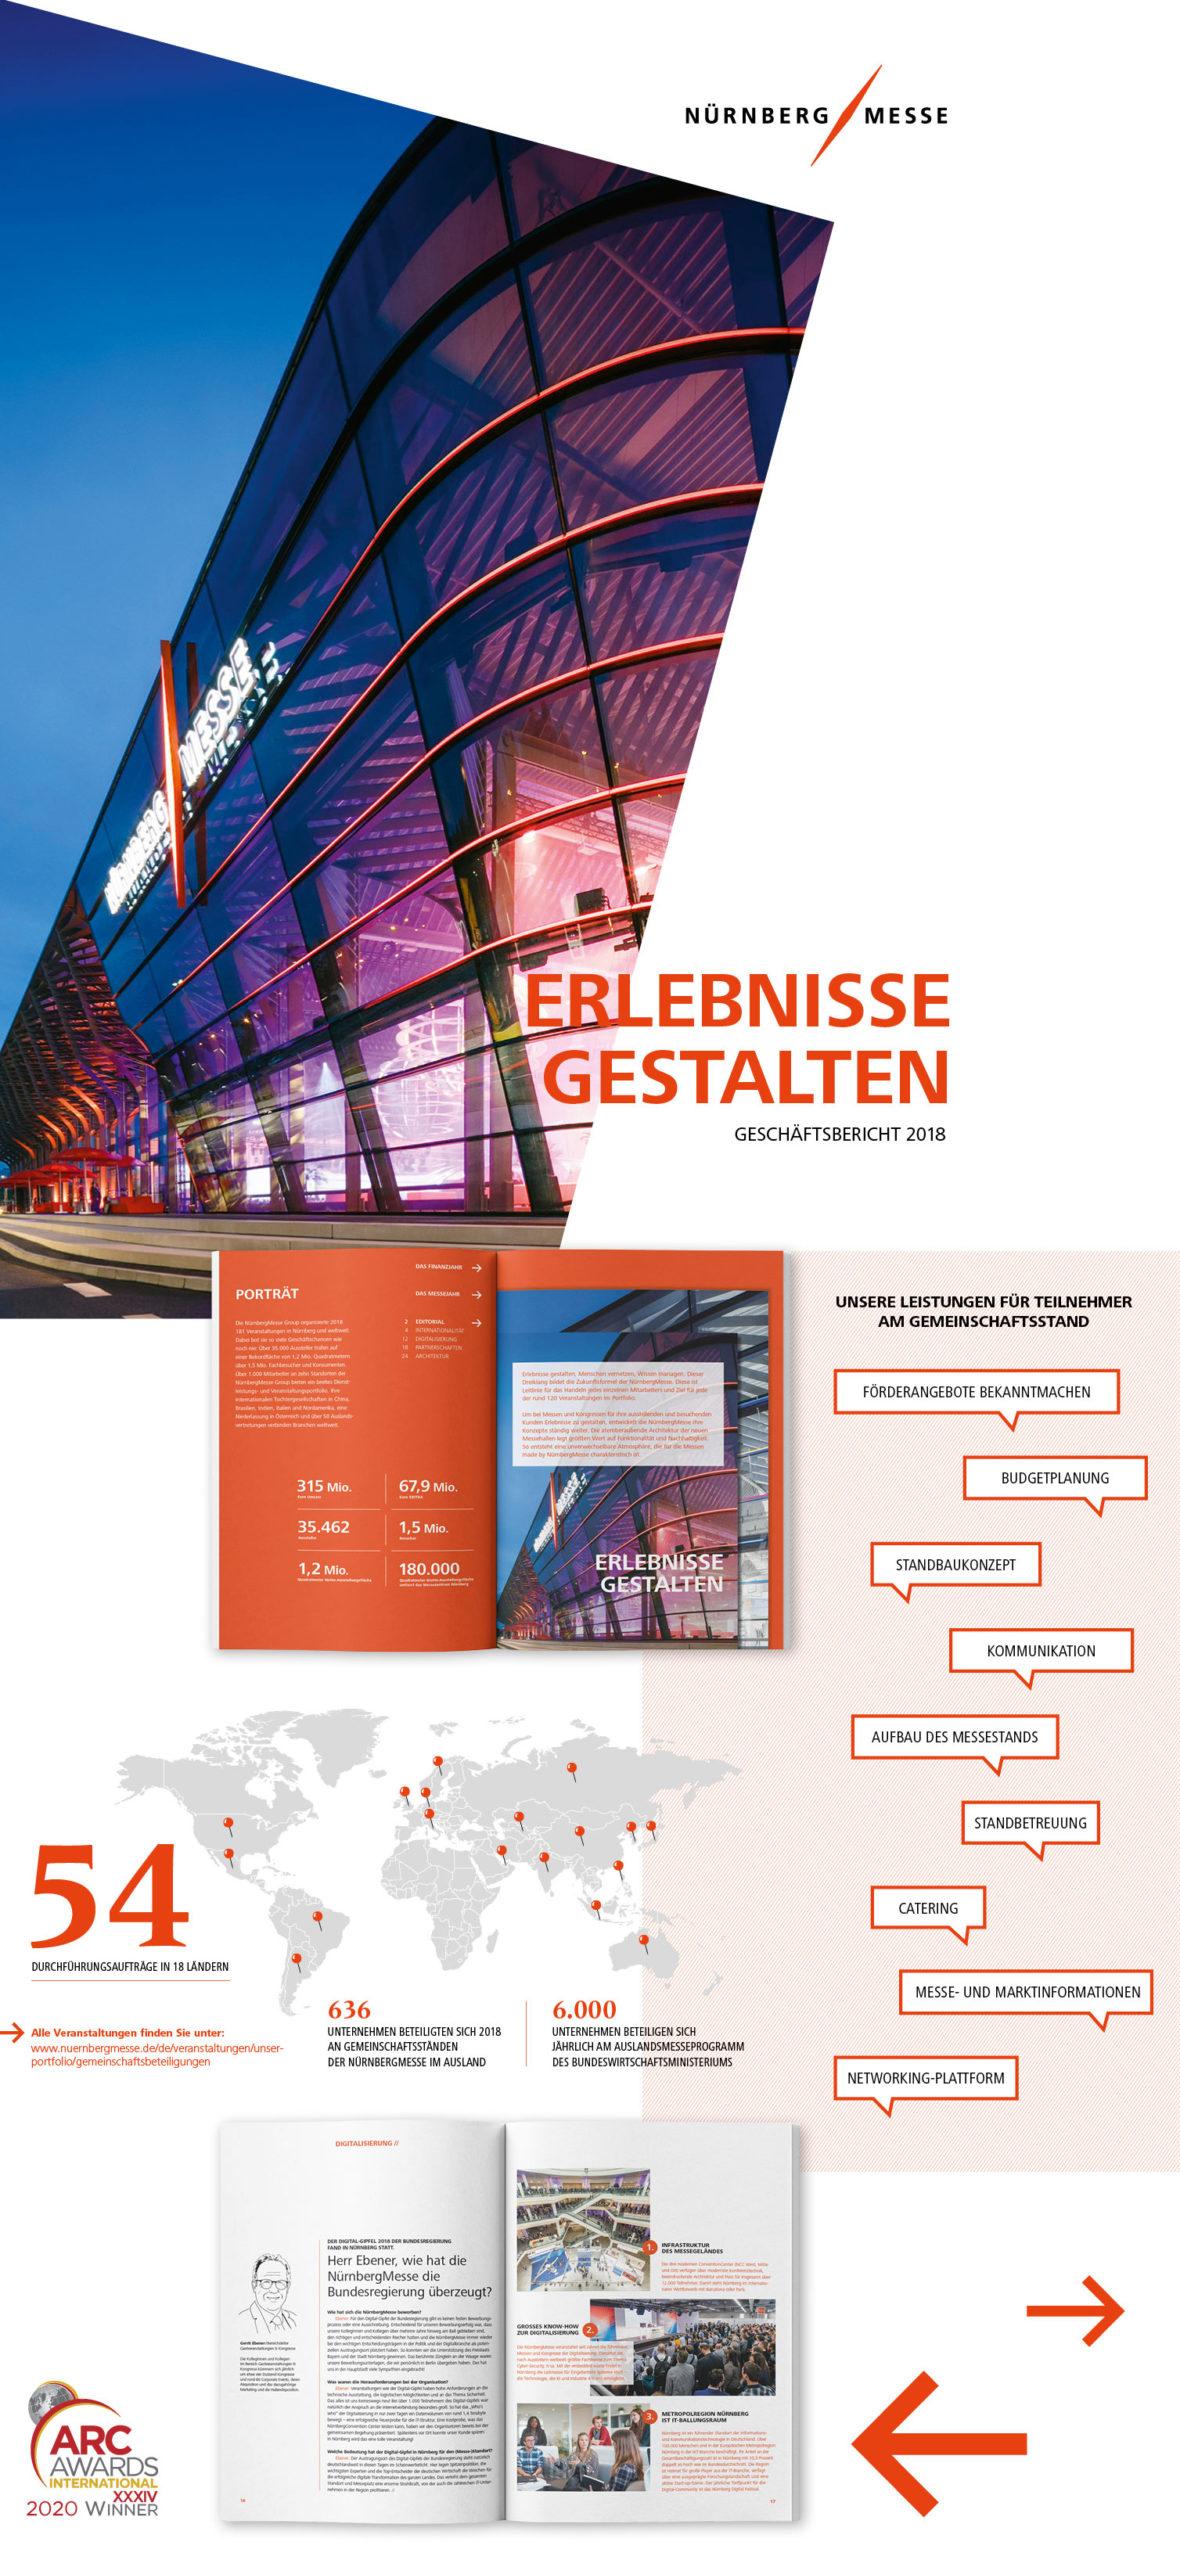 NürnbergMesse Geschäftsbericht 2018